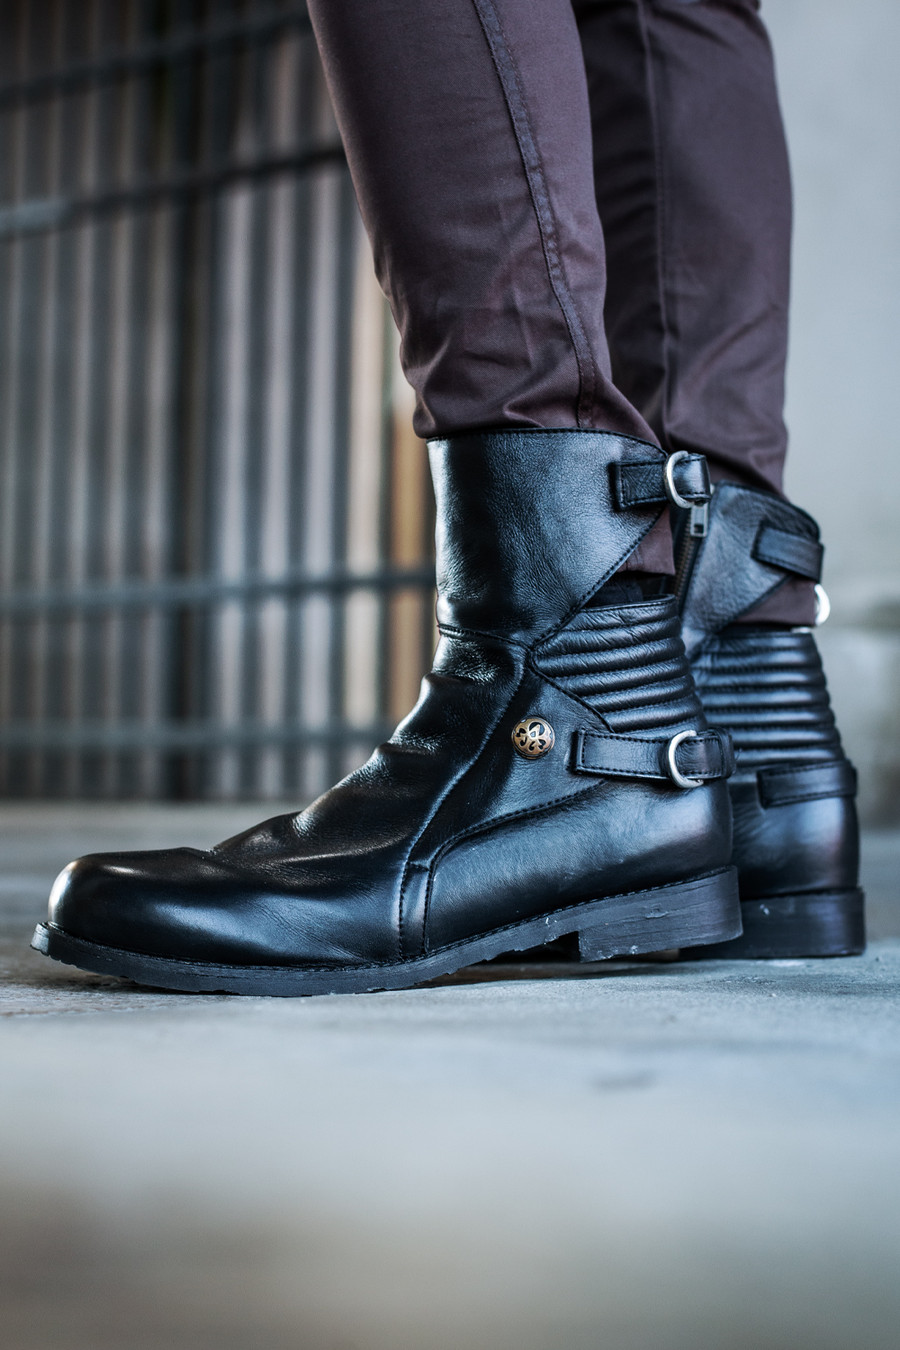 Pathfinder Boots